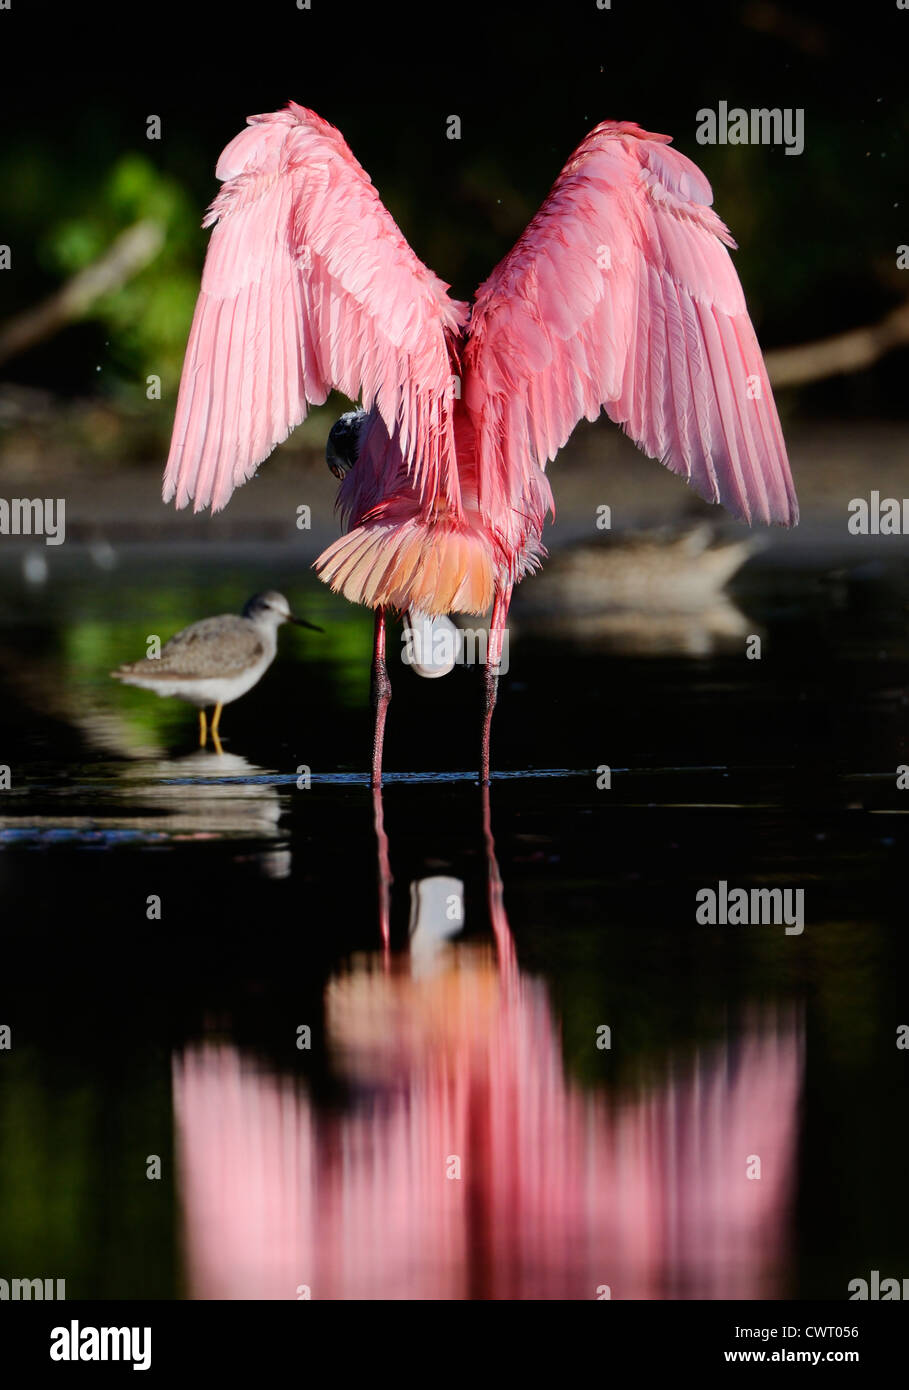 Rosige Löffler erstreckt sich seine Flügel Stockbild